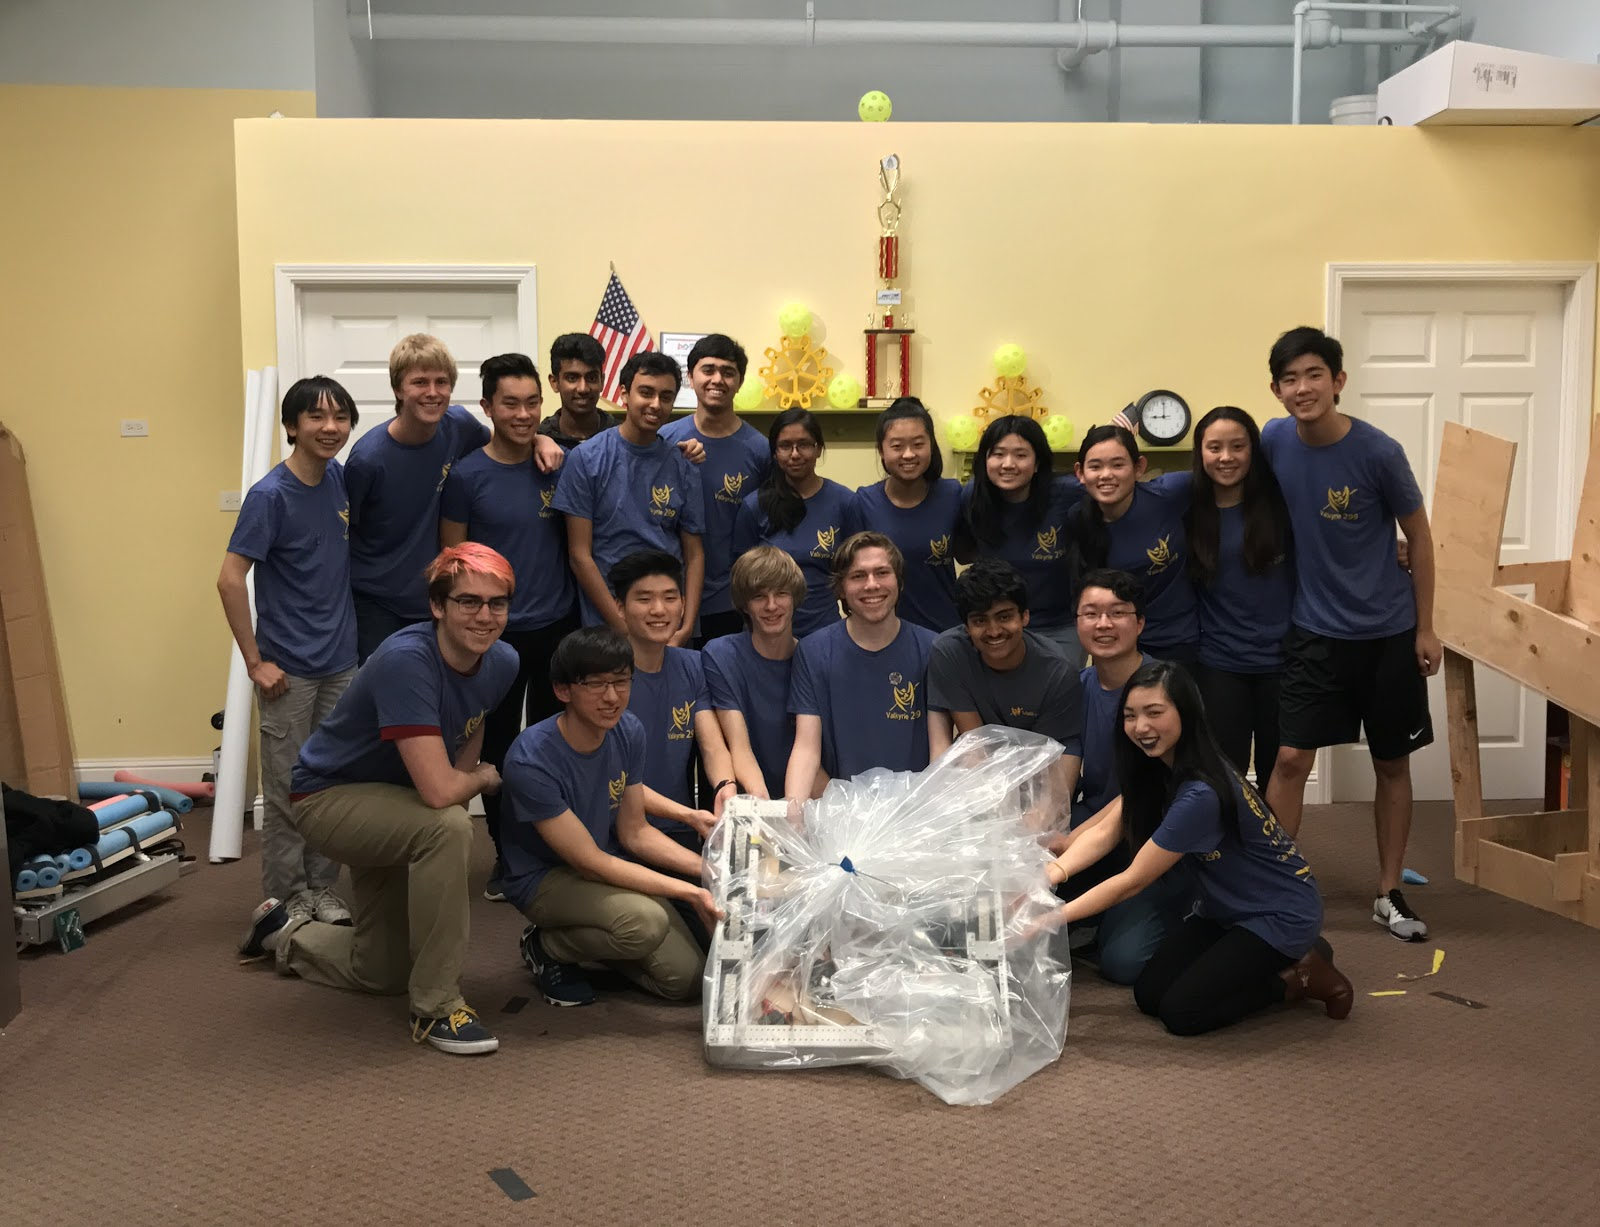 Valkyrie Robotics on Stop Build Day